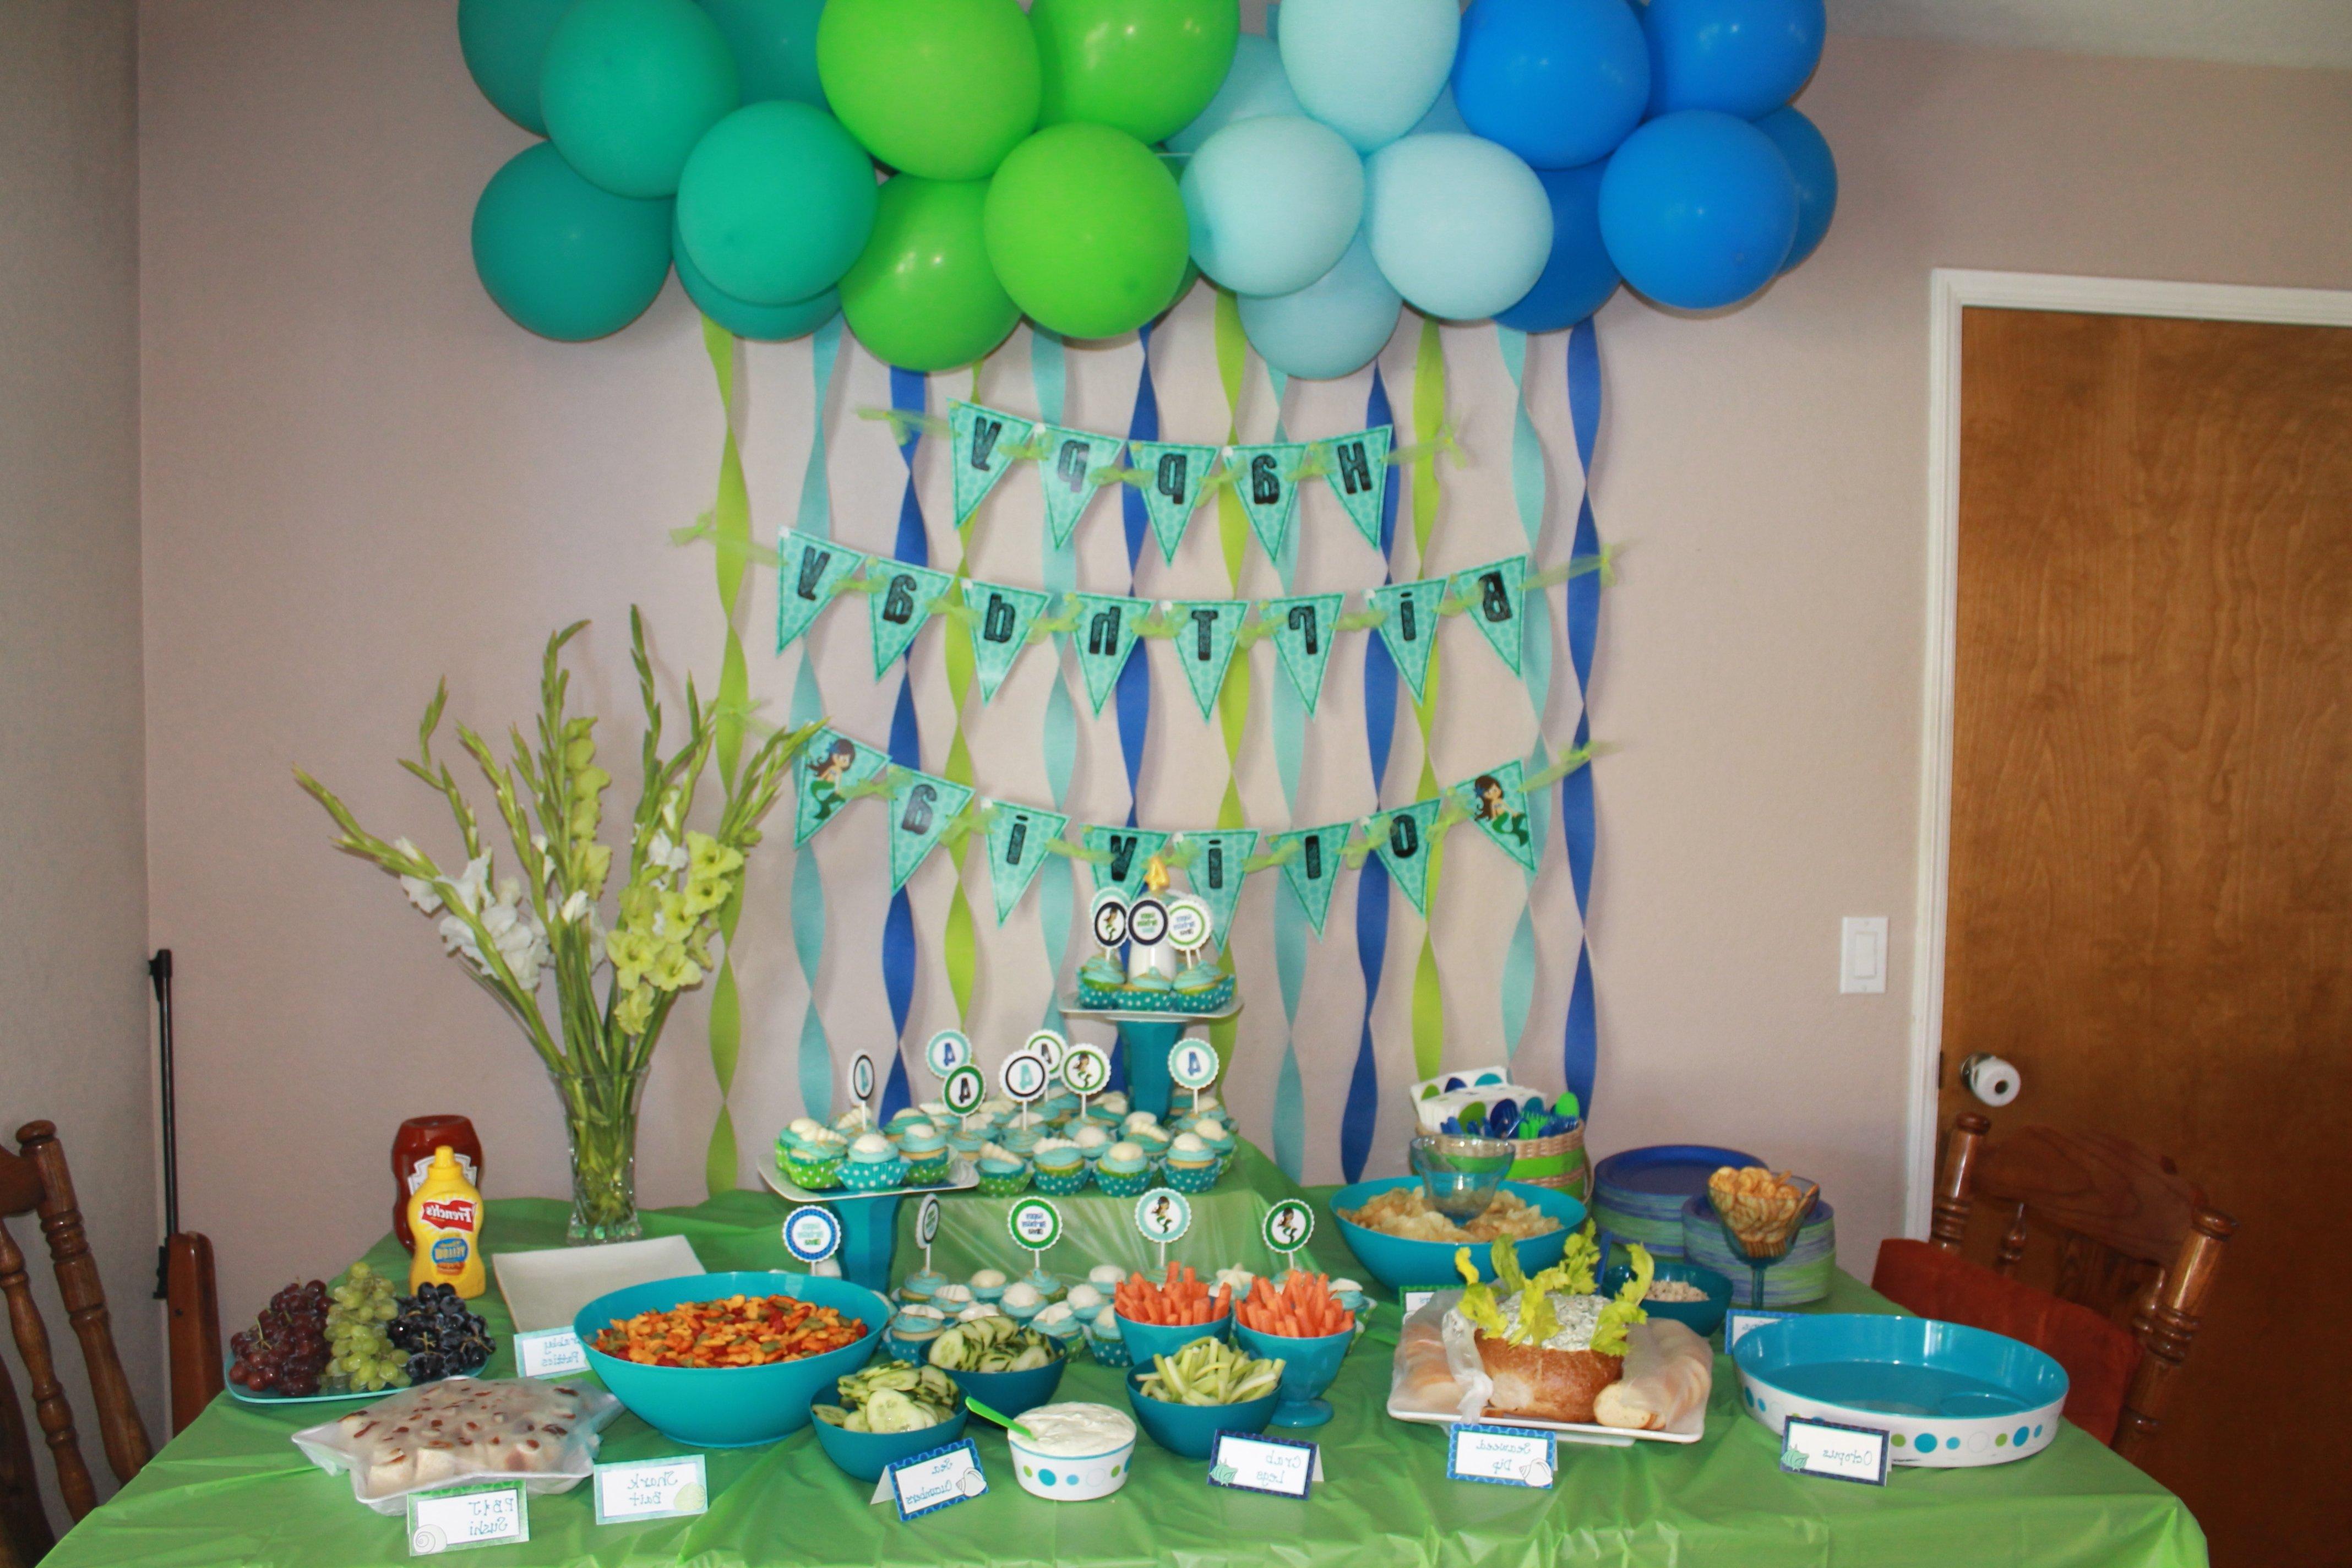 10 Spectacular Decoration Ideas For Birthday Party ideas for birthday decoration at home decoration ideas for birthday 2020